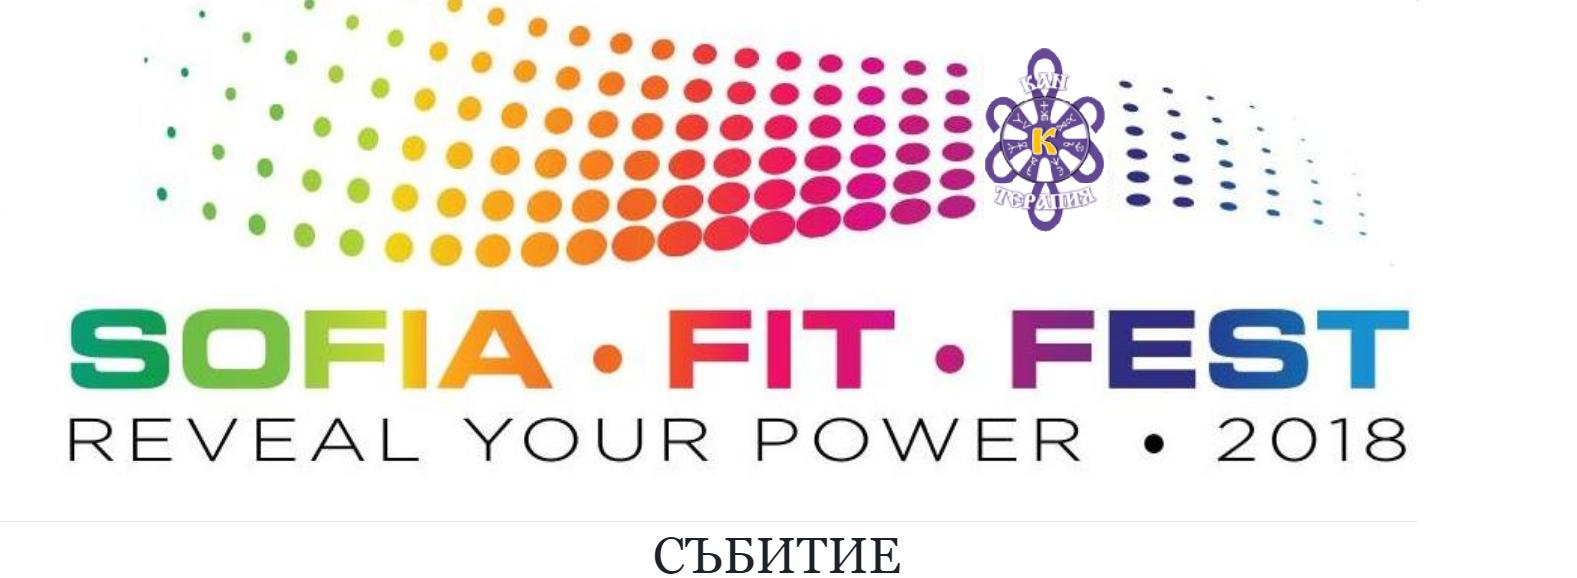 sofia fit fest logo